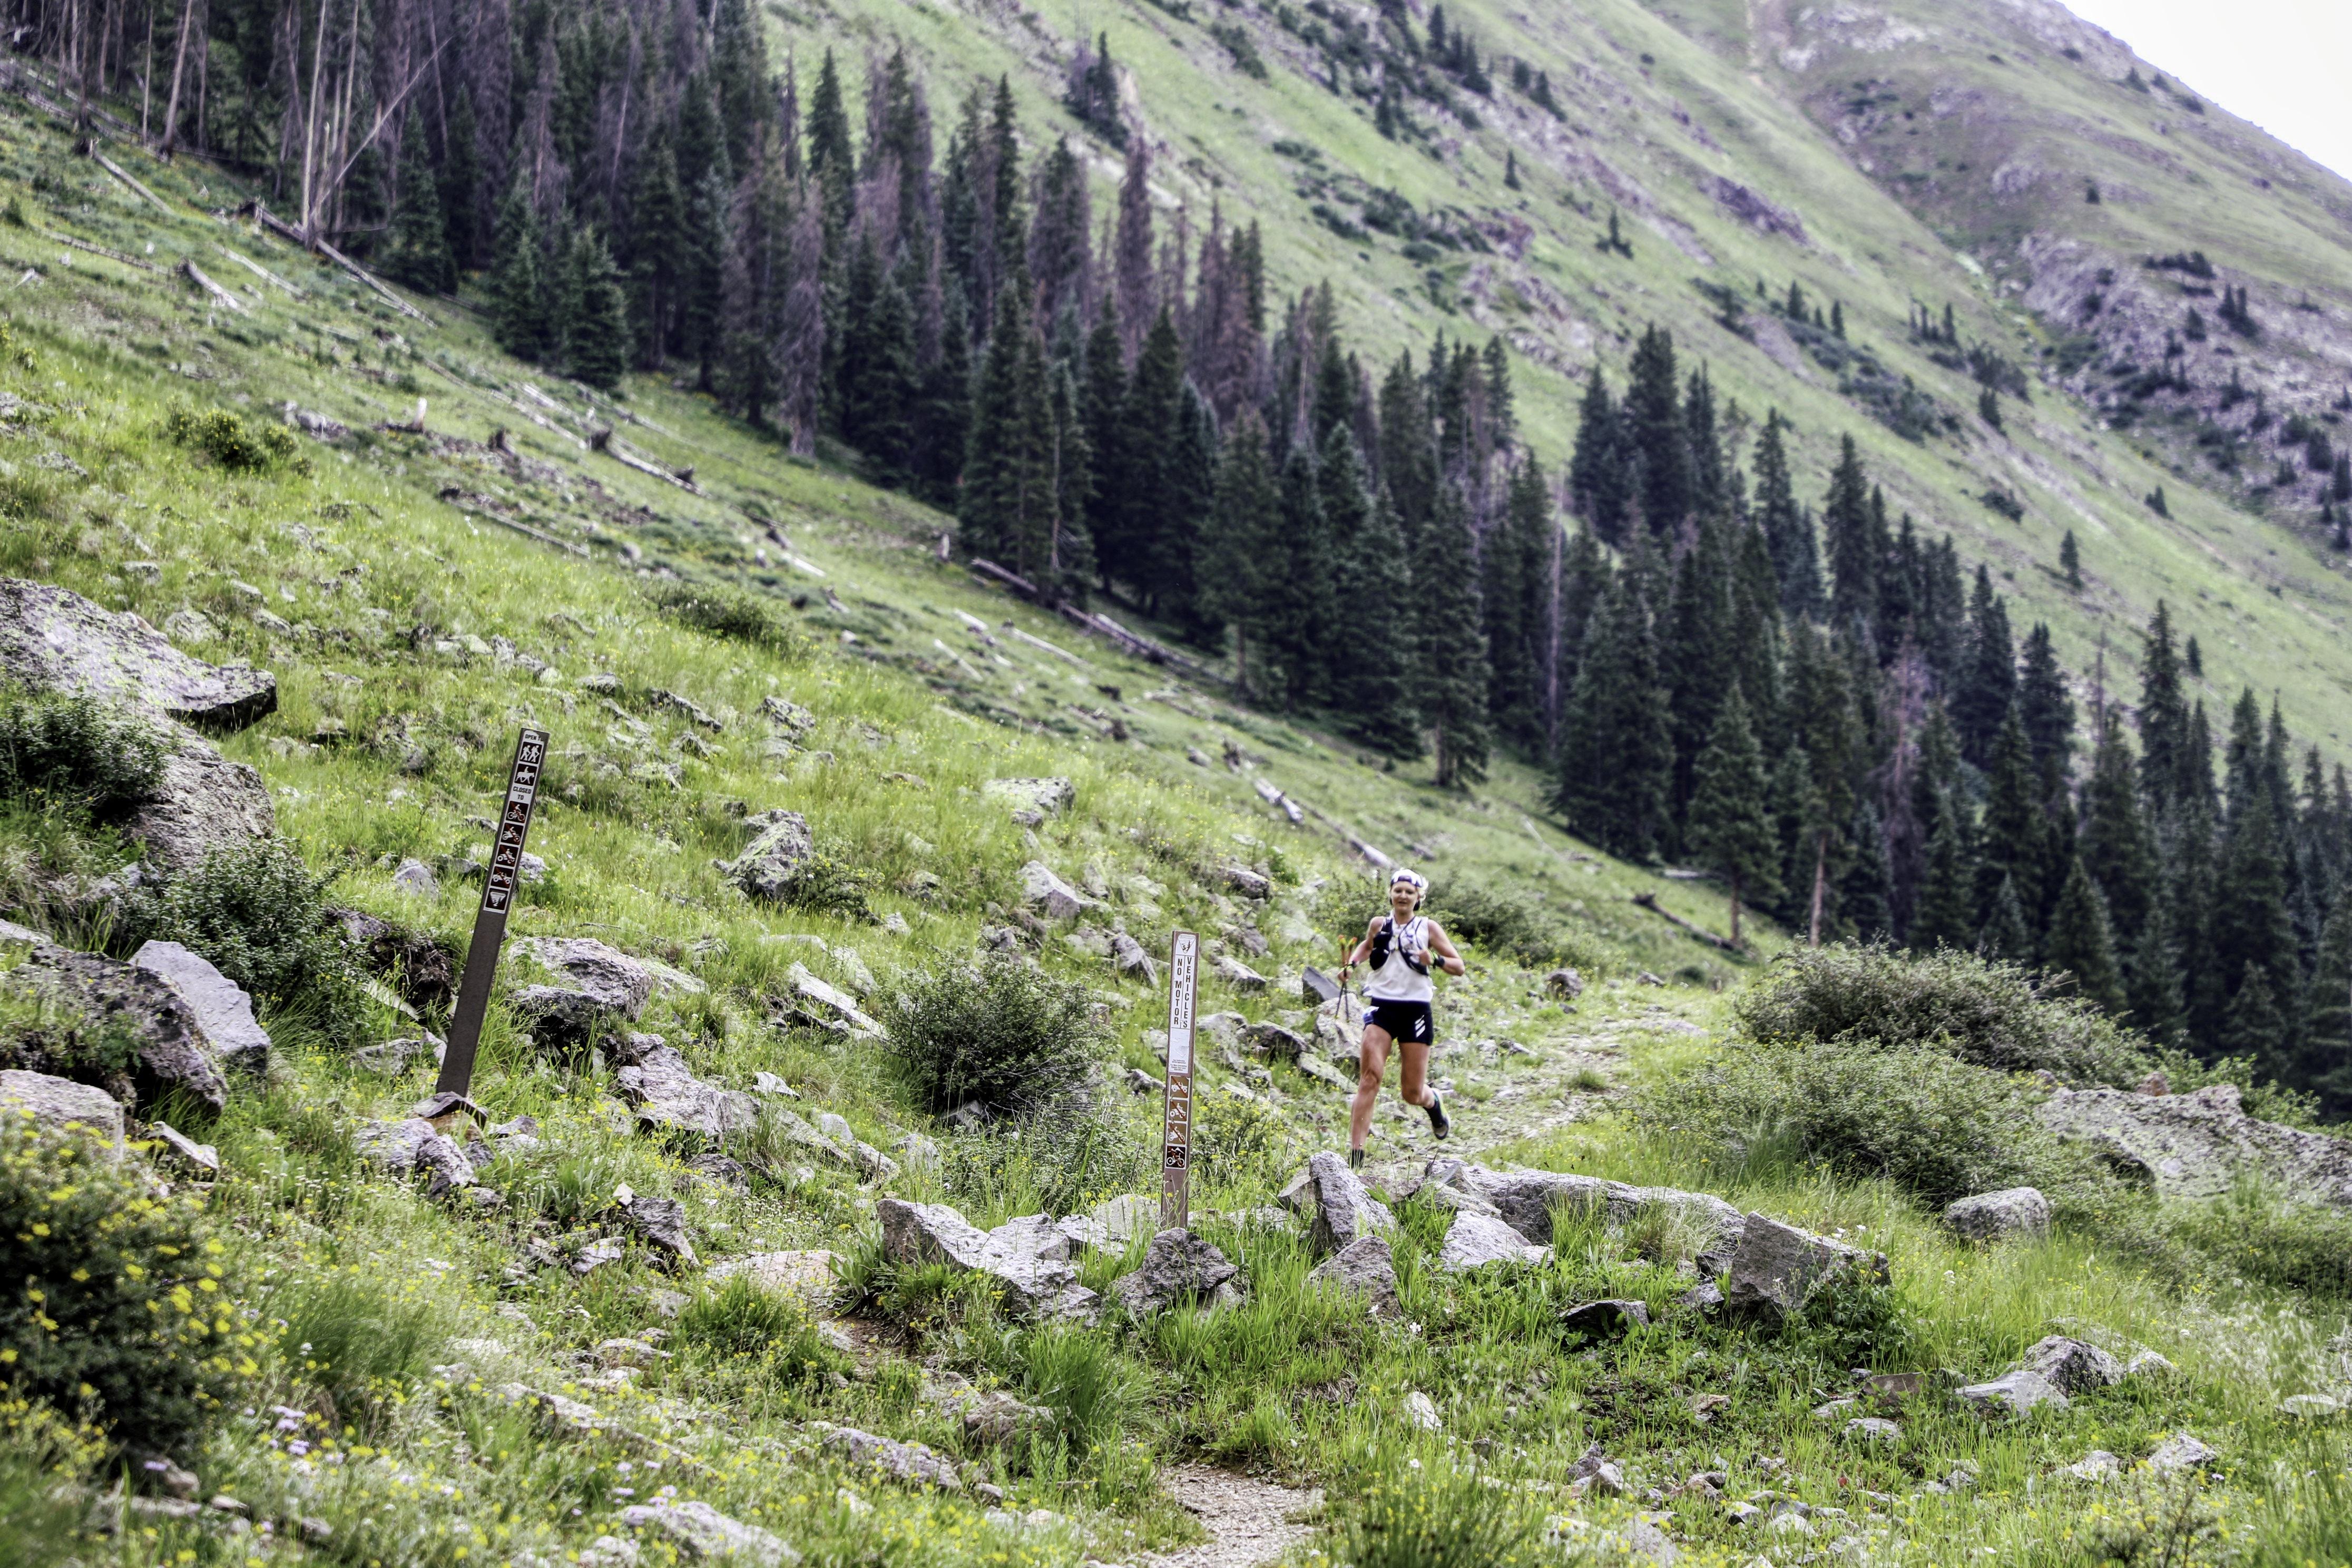 woman running in Hardrock 100 endurance race